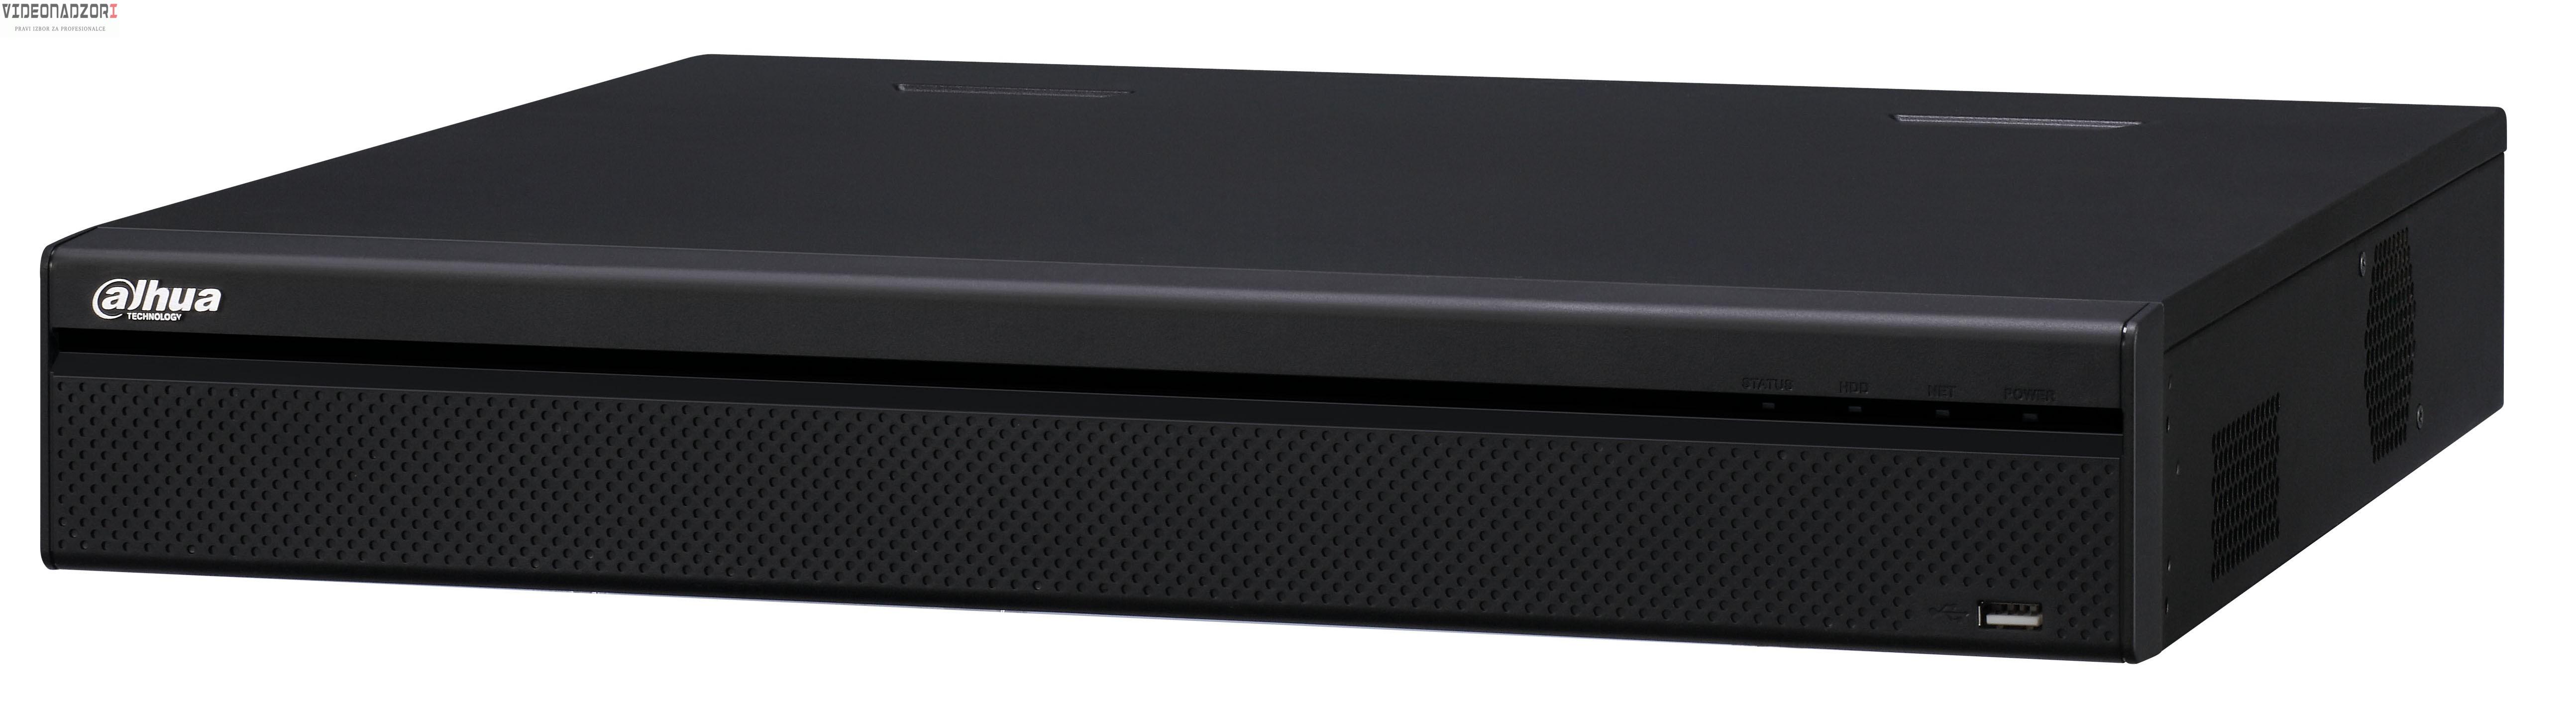 Dahua pro Tribrid HDCVI 32 kanalni video snimac HCVR-5432LS2 Svaki kanal podržava HDCVI, Analog, IP prodavac VideoNadzori Hrvatska  za 12.498,75kn